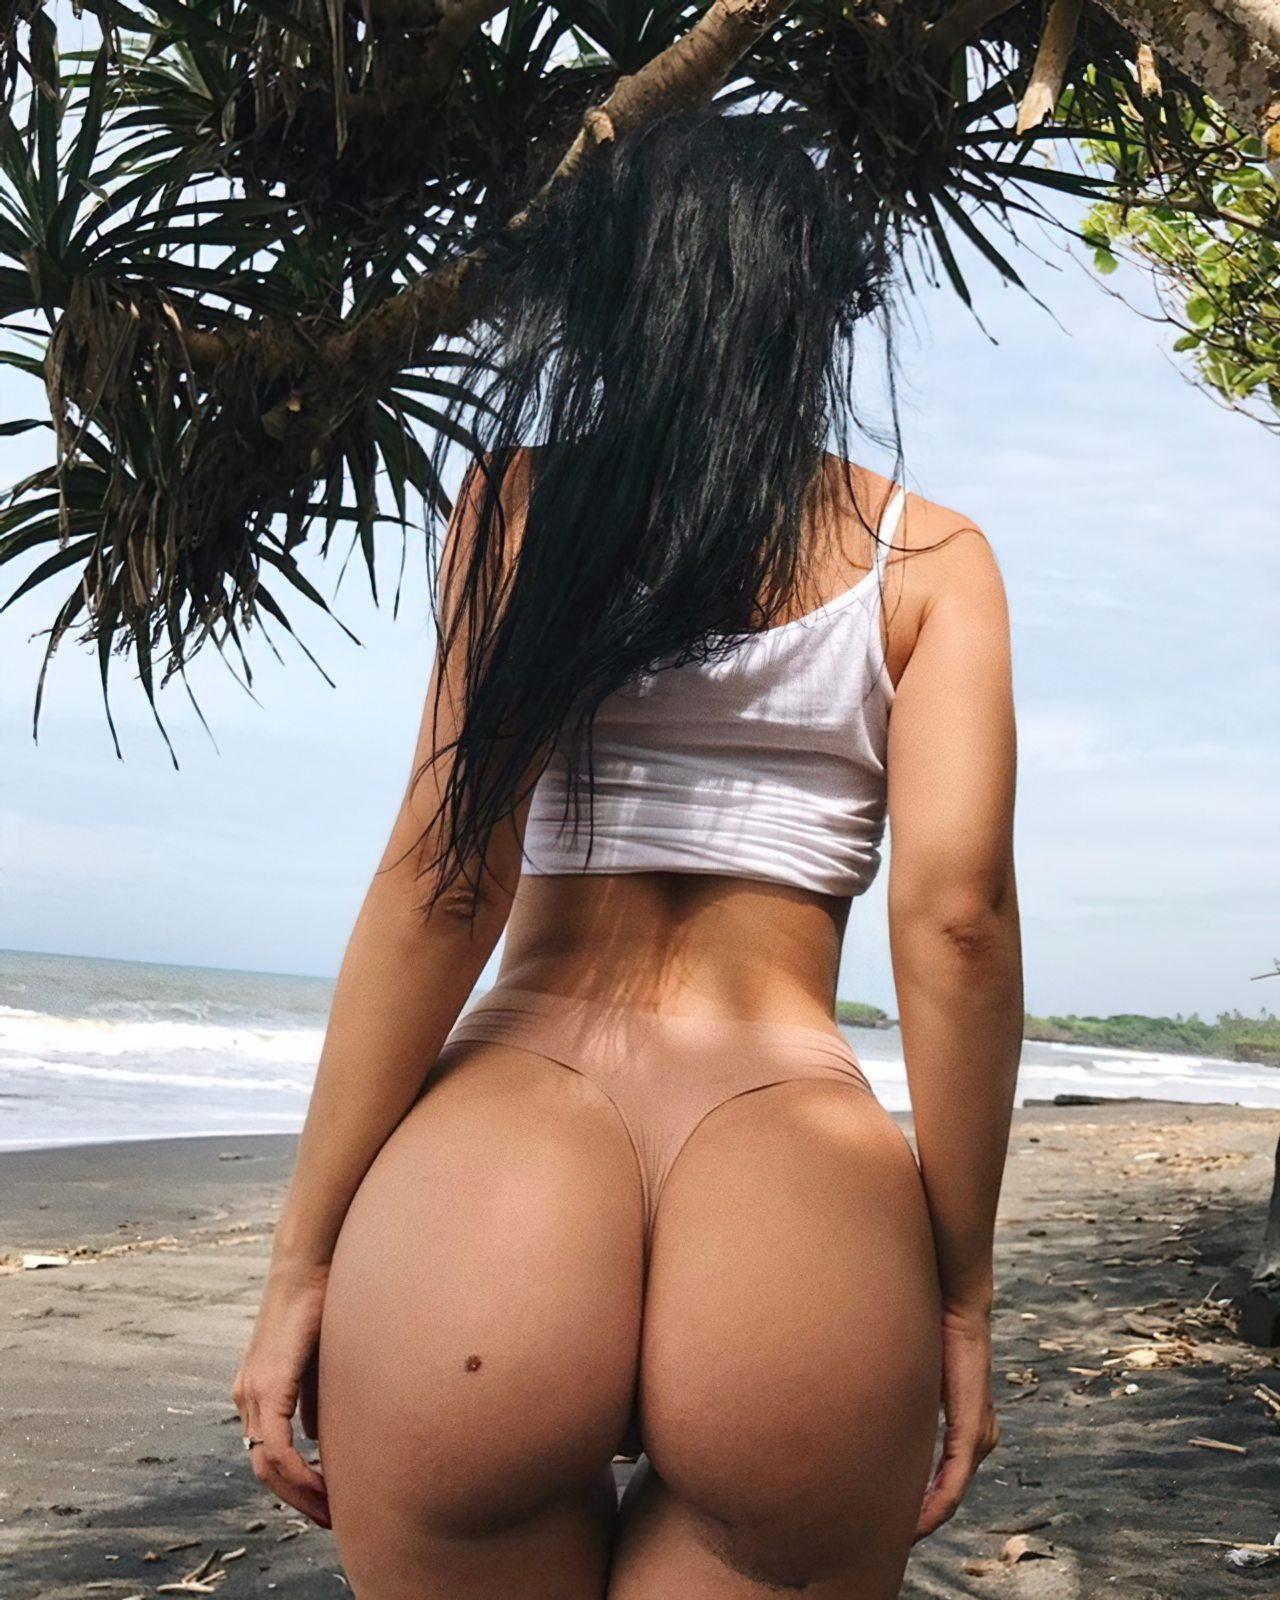 Fotos de Mulheres Nuas (24)